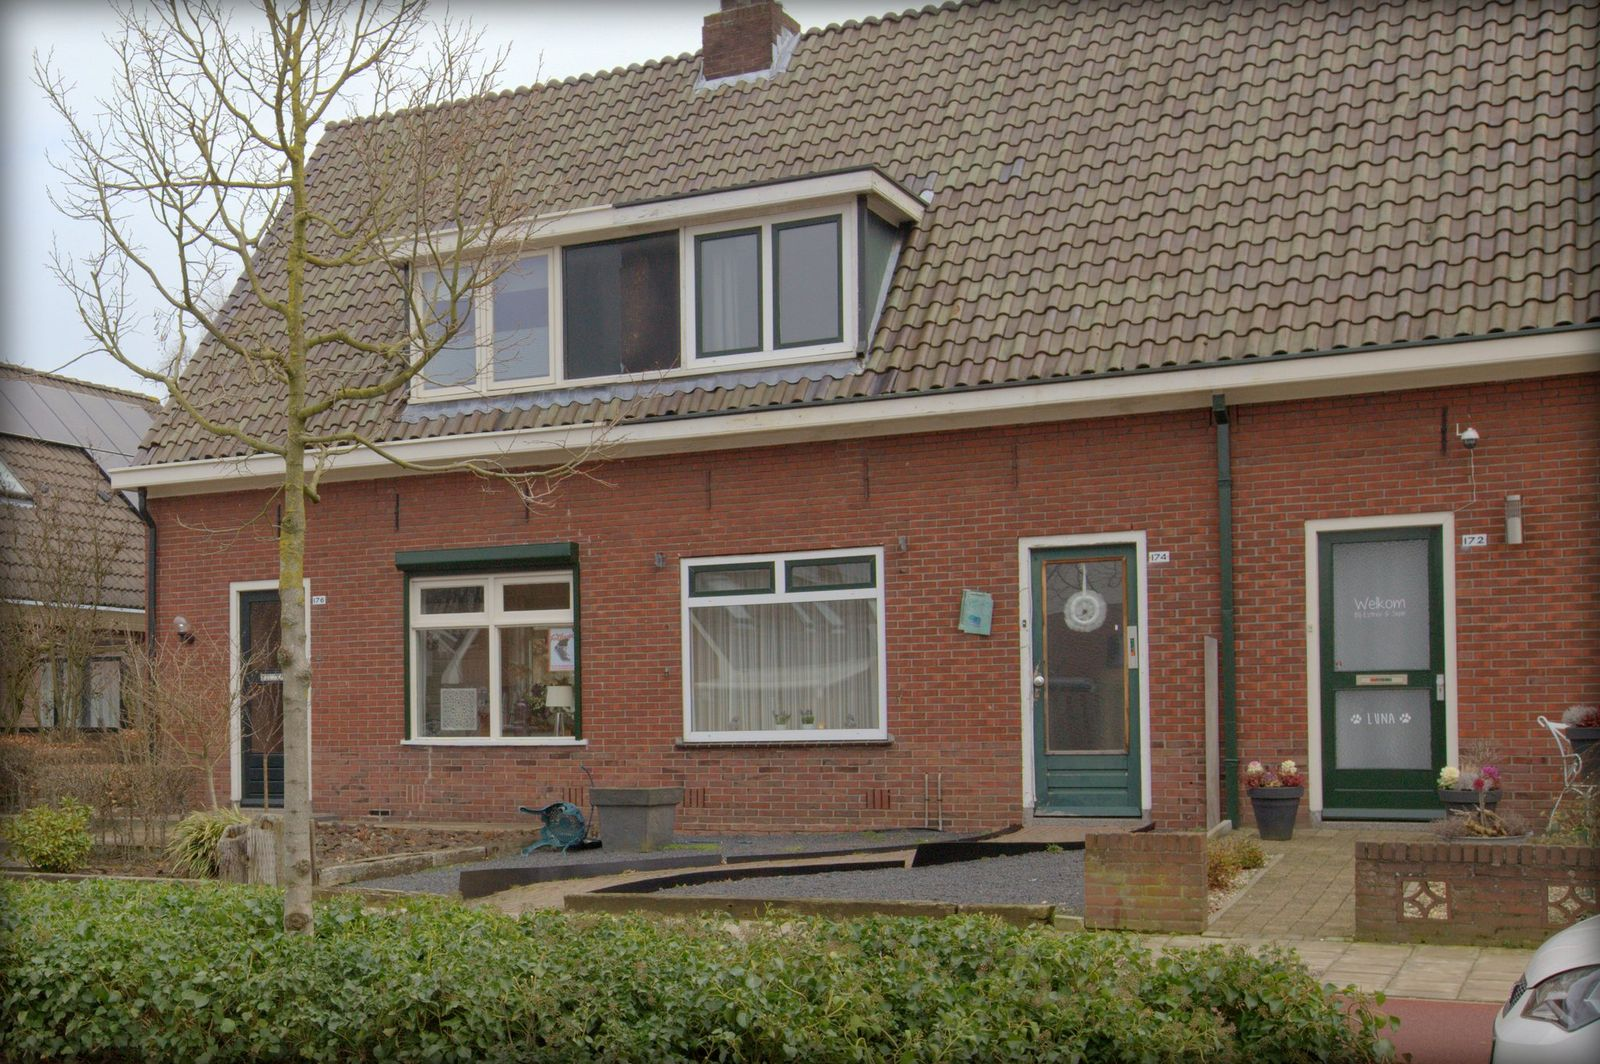 Waliensestraat 174, Winterswijk